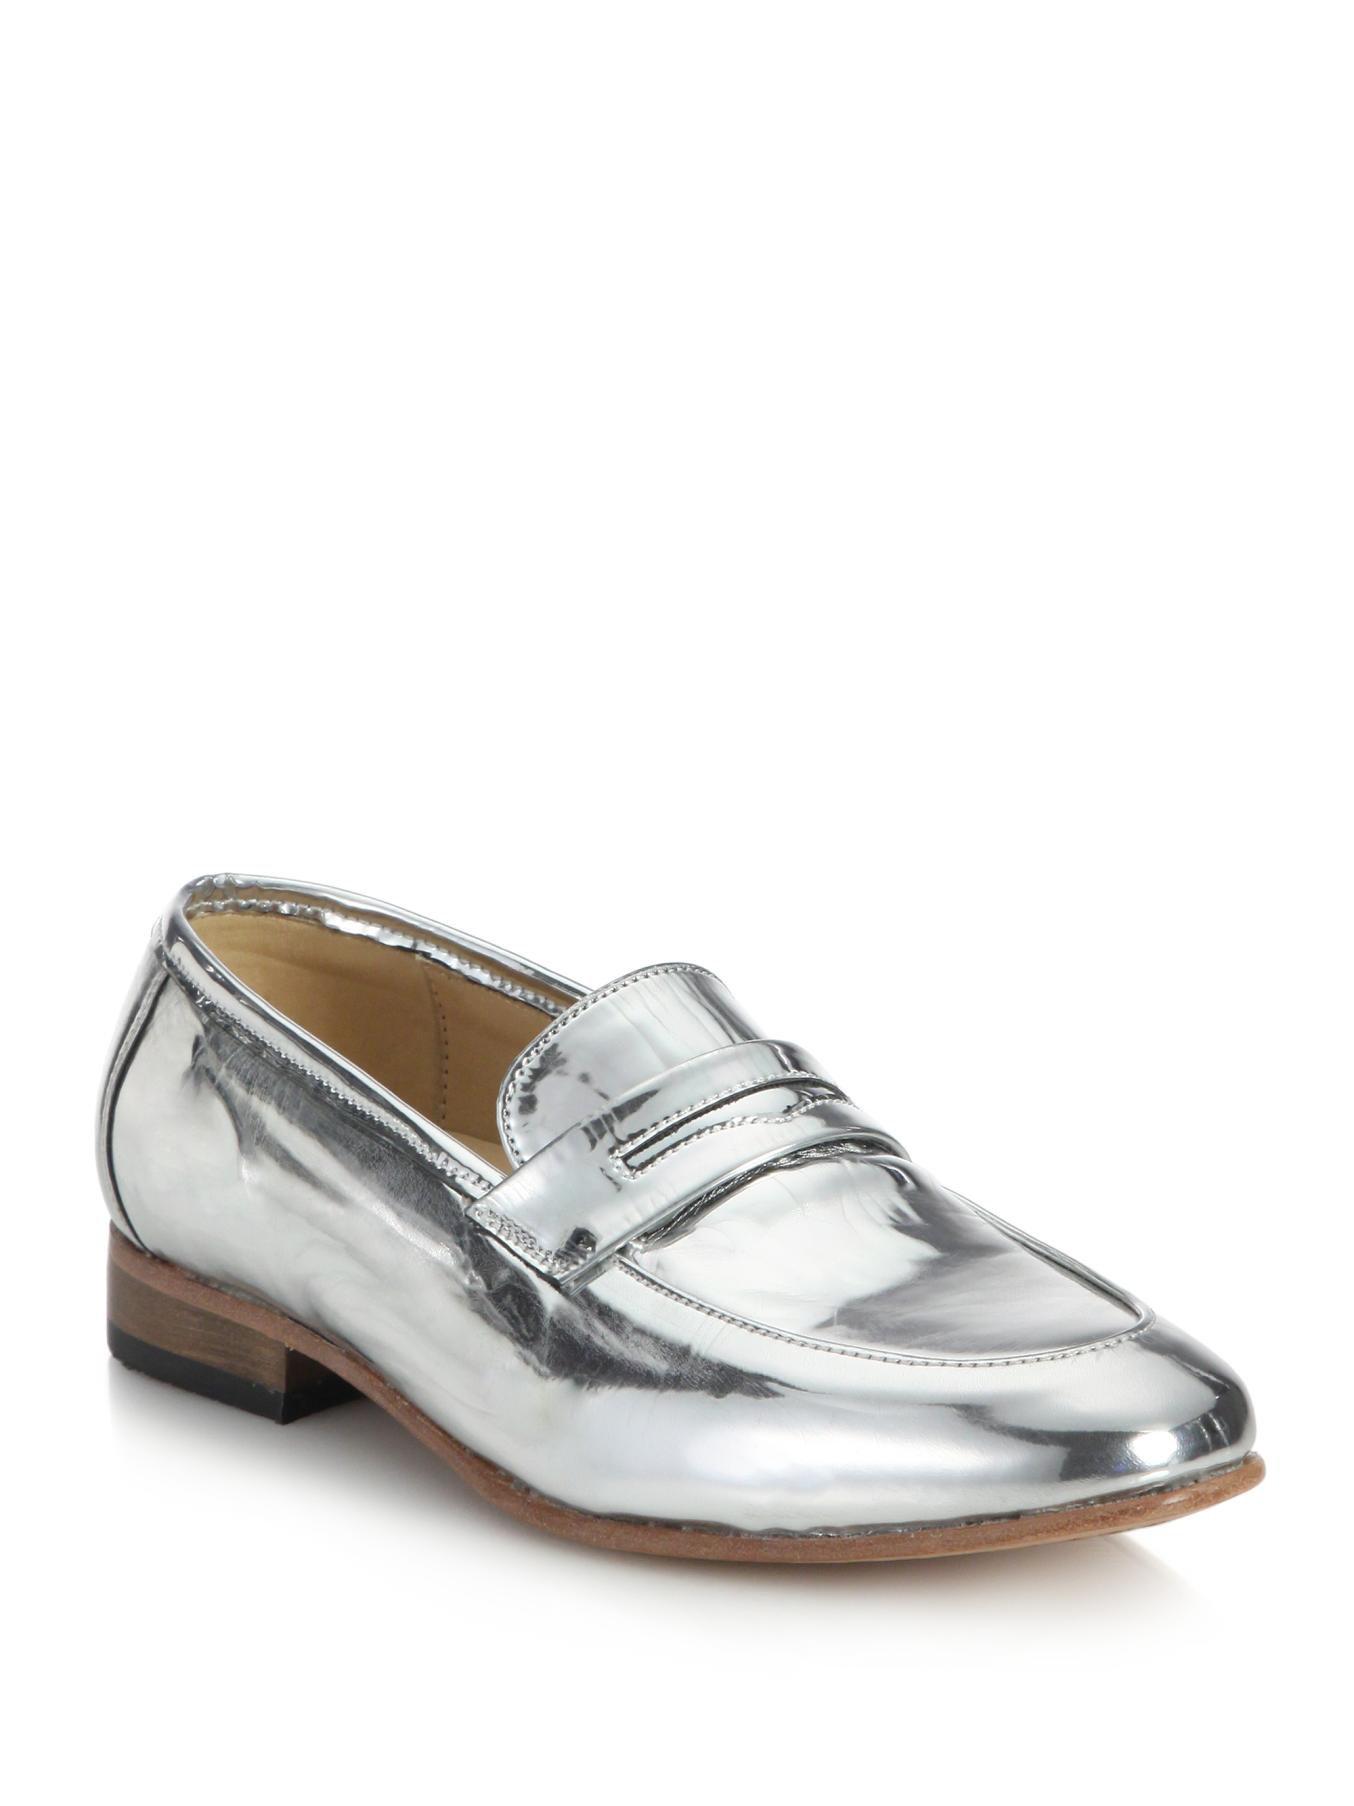 8e7c3470c Lyst - Dieppa Restrepo Metallic Leather Penny Loafers in Metallic